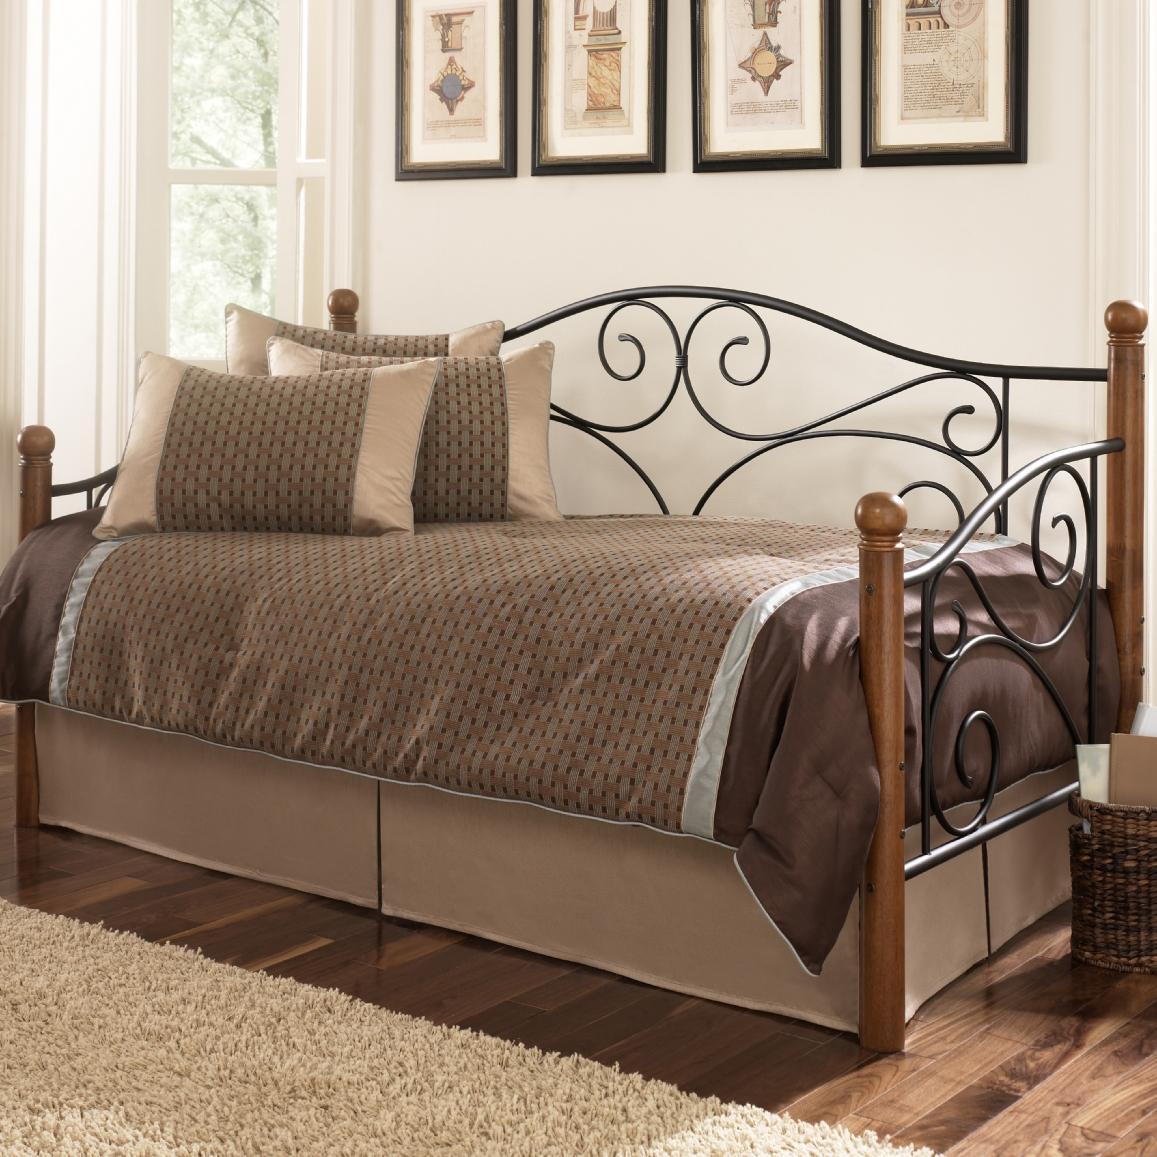 Zip Link Beds >> Fashion Bed Group Daybeds Doral Daybed w/ Link Spring | Baer's Furniture | Daybeds